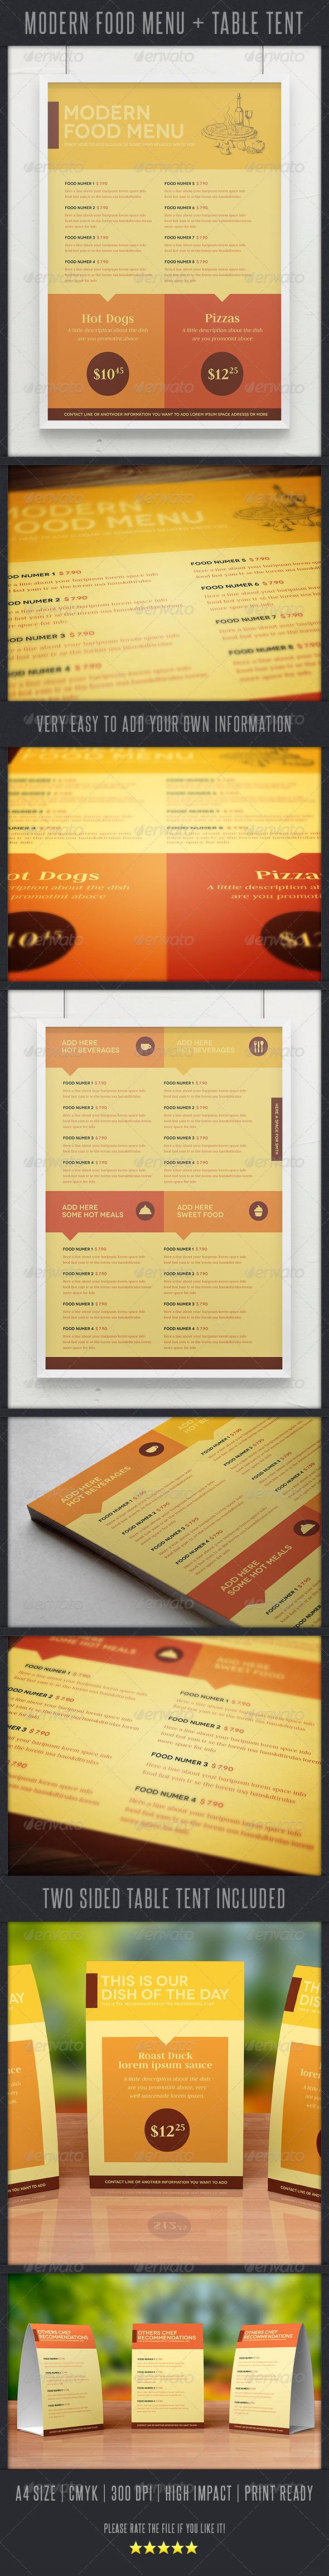 GraphicRiver Modern Food Menu 3956737